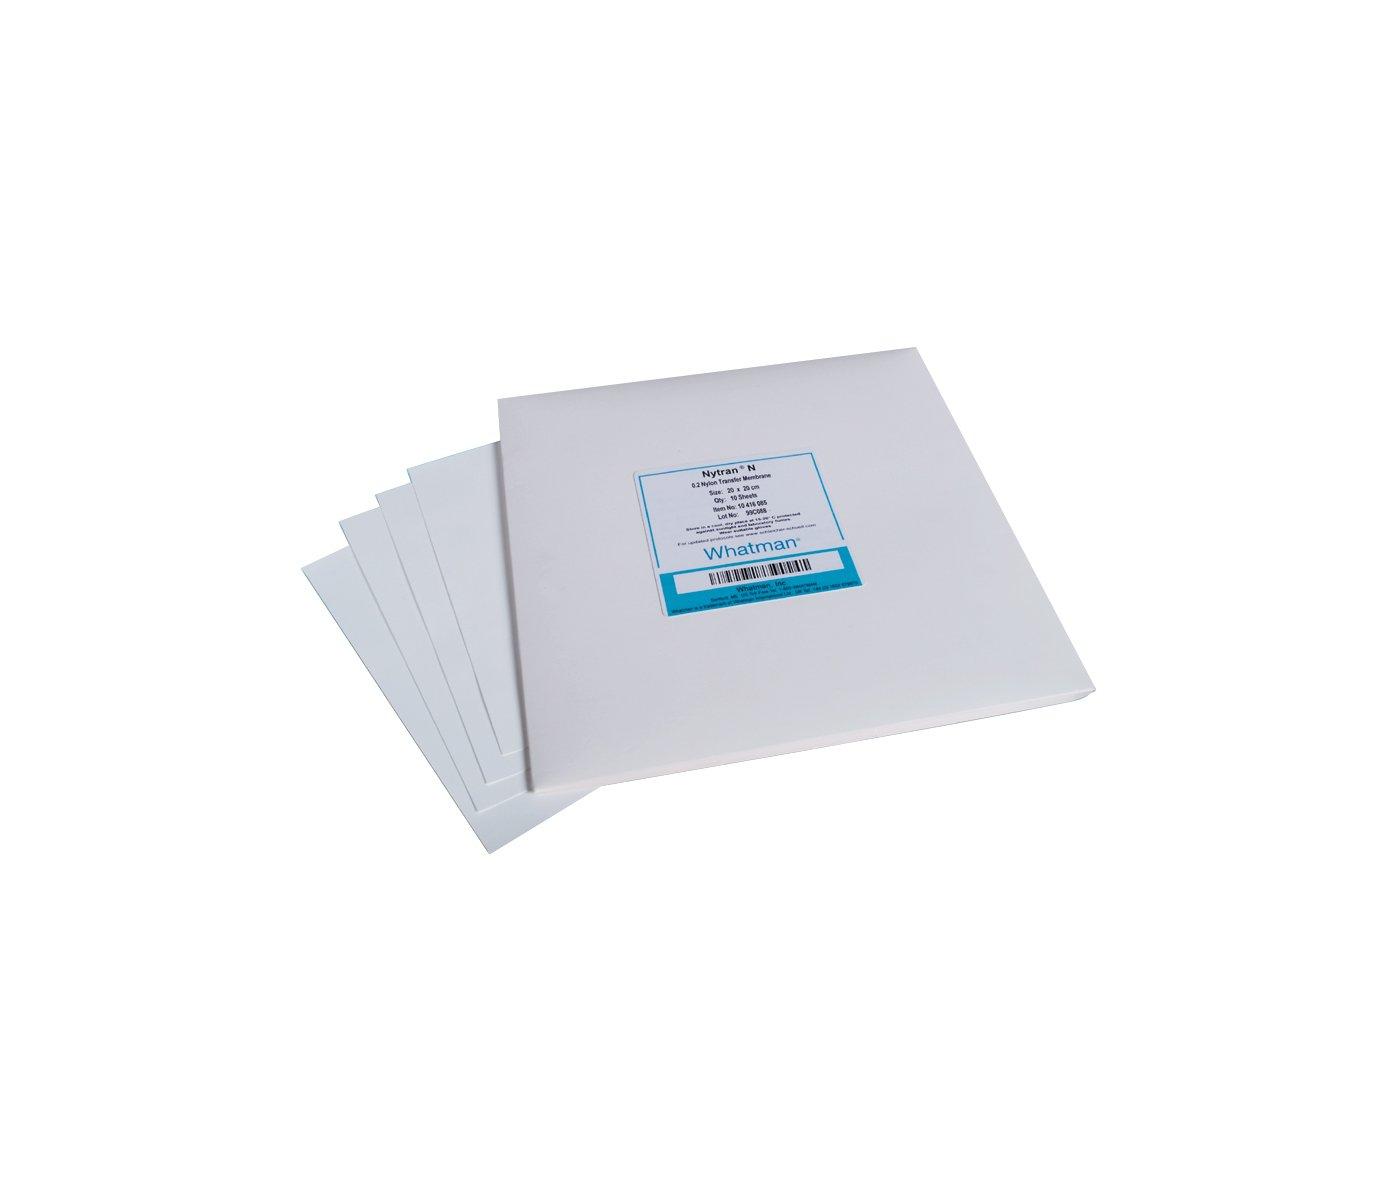 Whatman 10416296 Nylon Nytran Super Charge Blotting Filter Membrane Roll 3m Length x 30cm Width 0.45 Micron